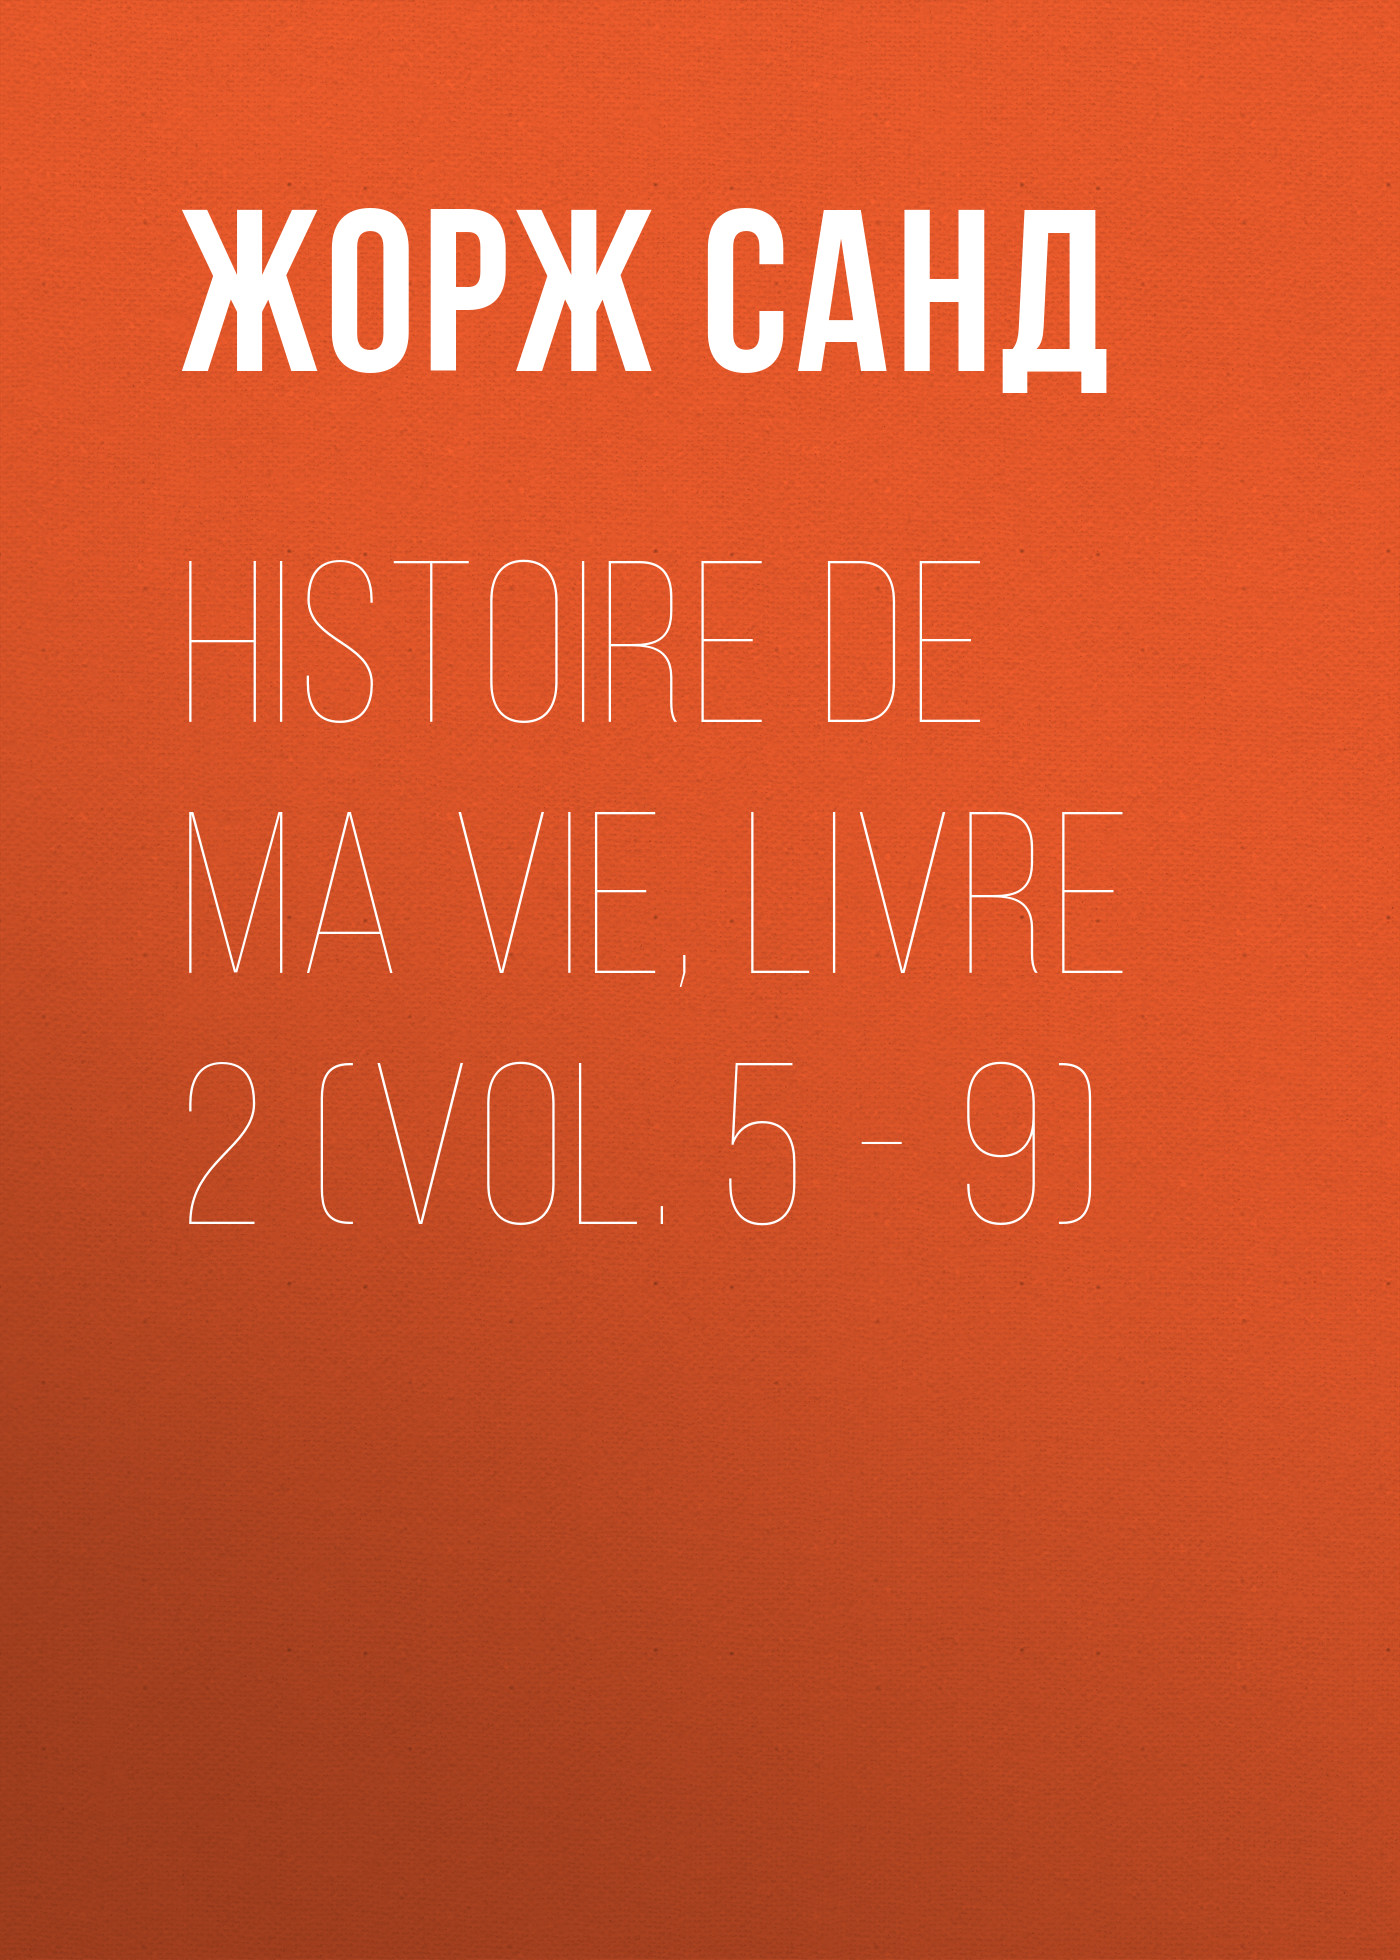 Жорж Санд Histoire de ma Vie, Livre 2 (Vol. 5 - 9) adosphere 2 livre cd